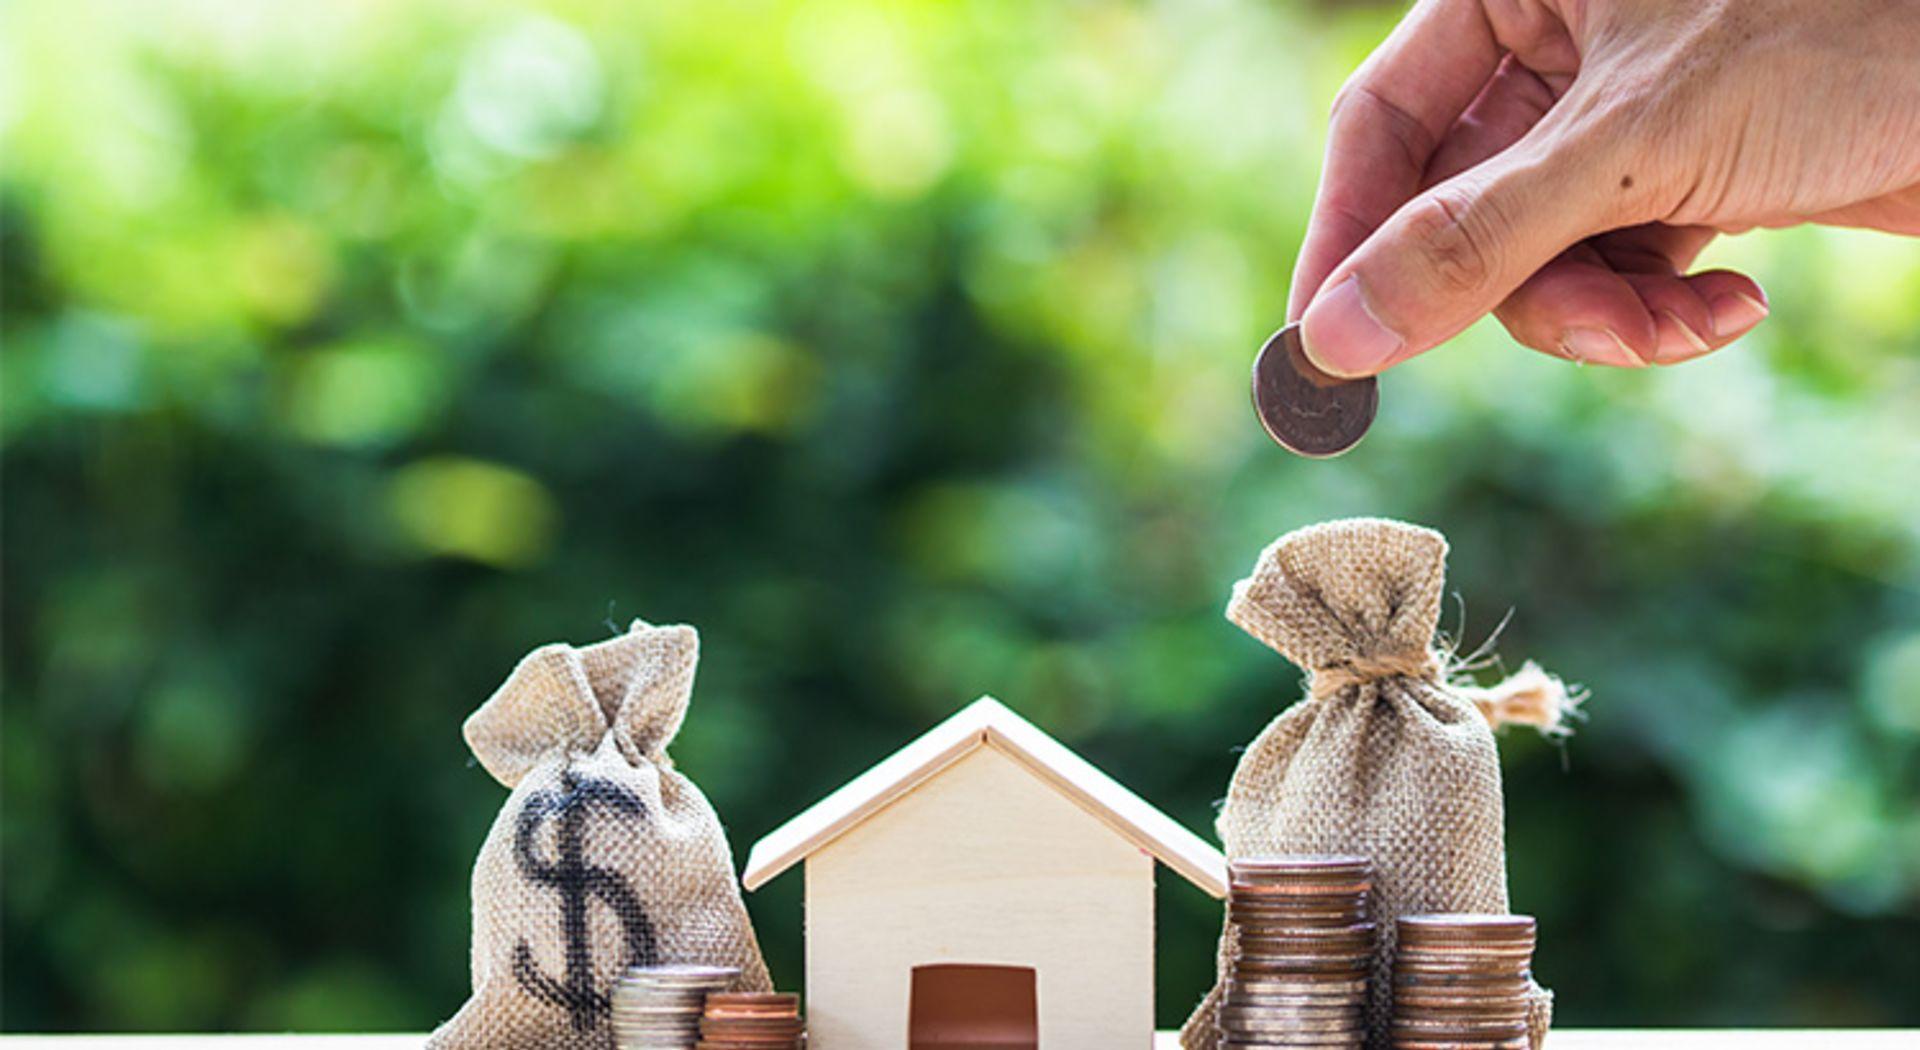 Should I Refinance My Home?